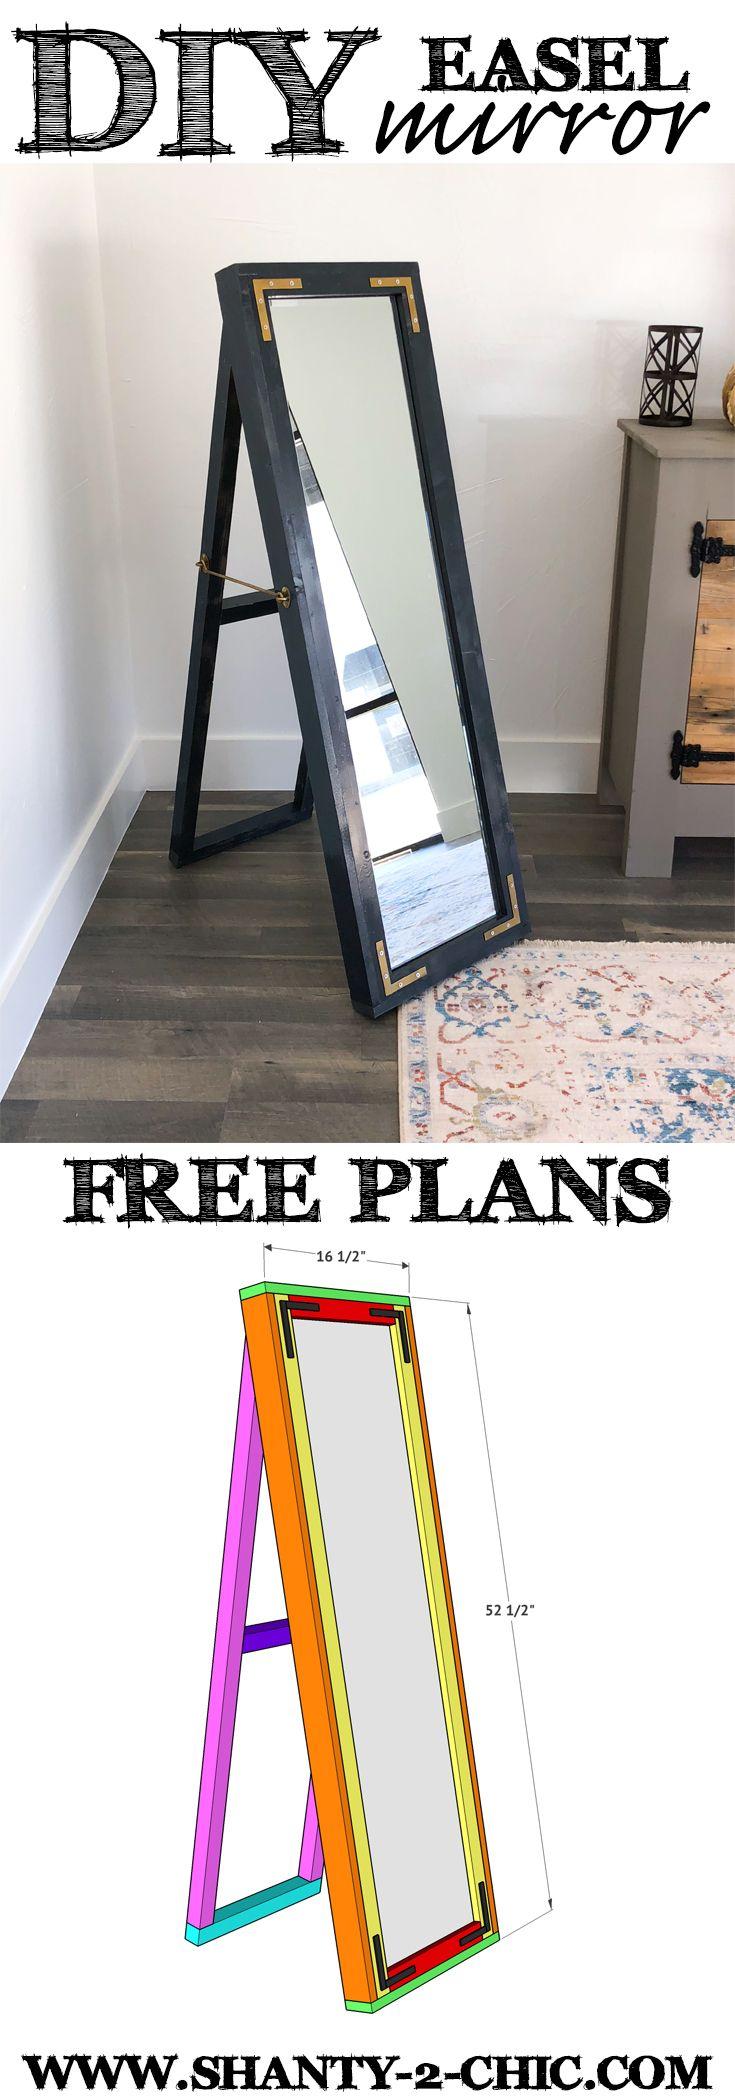 Diy Easel Mirror Diy Easel Diy Furniture Projects Diy Home Furniture